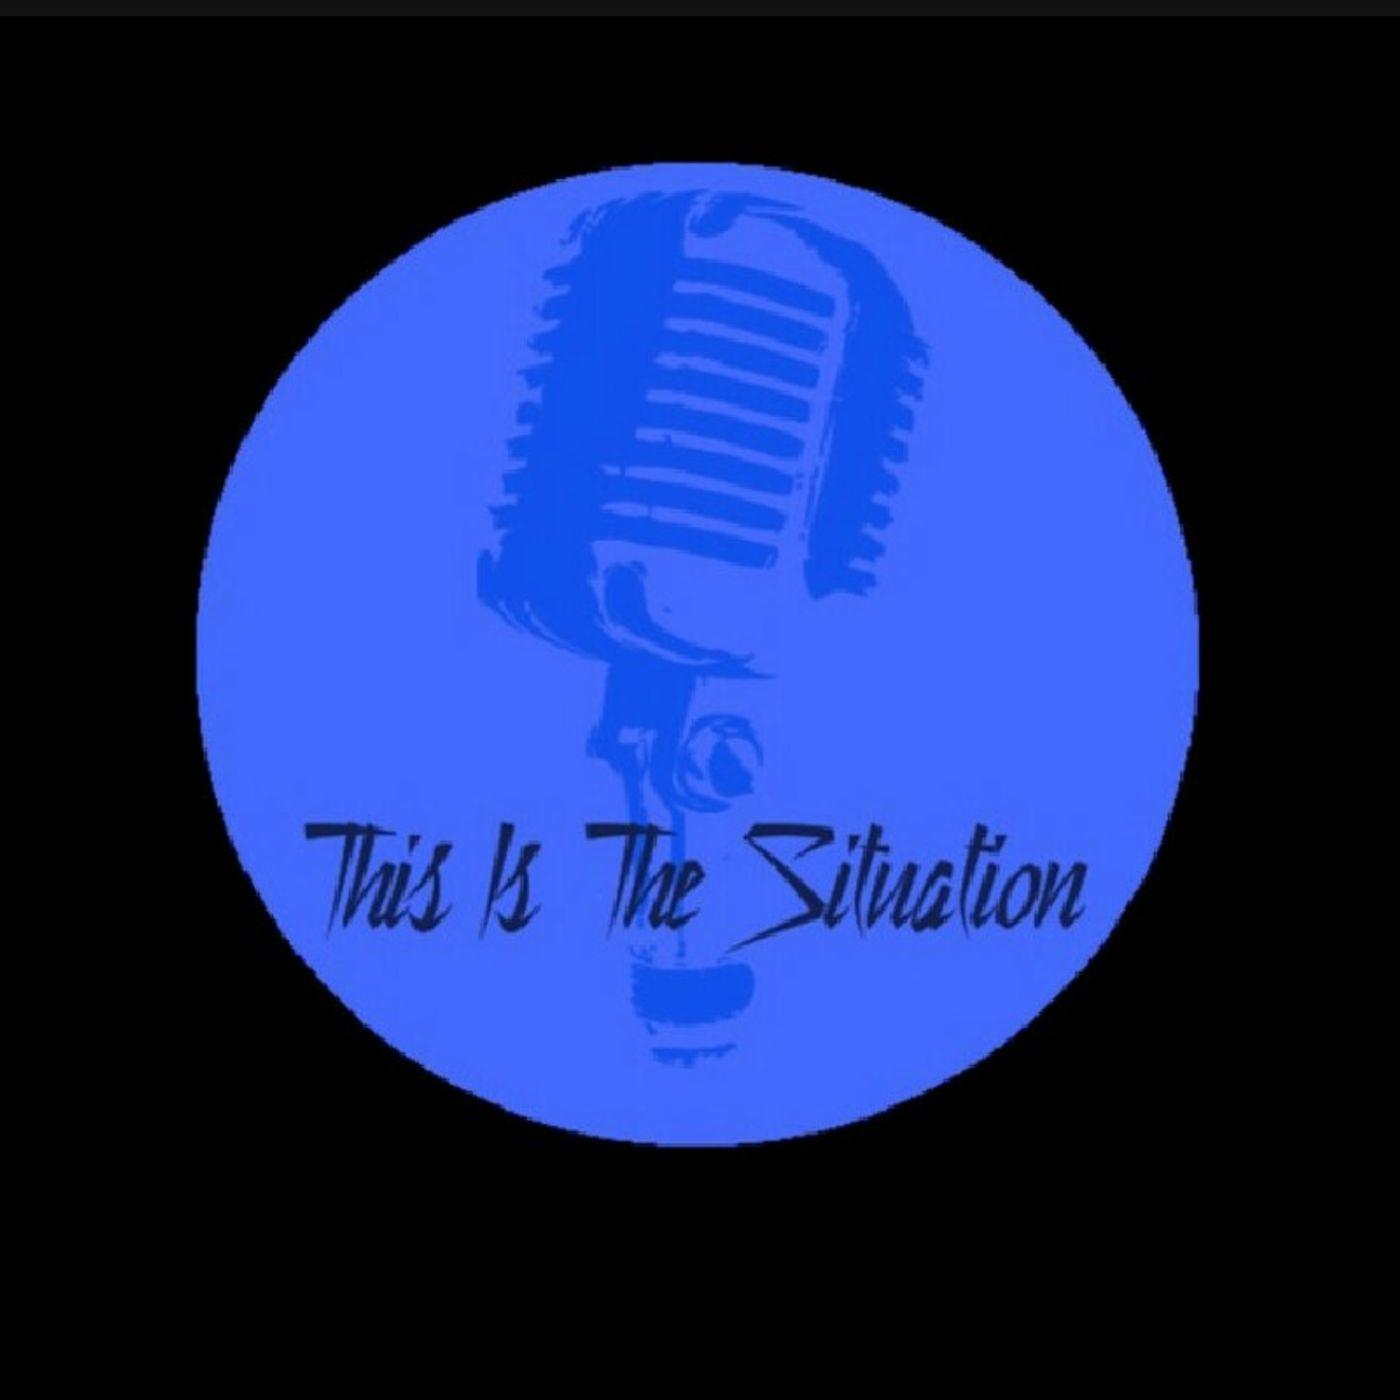 """ Alonestar"" Jethro Sheeran live this Sunday on 100.9FM WFFR Muskegon Radio"